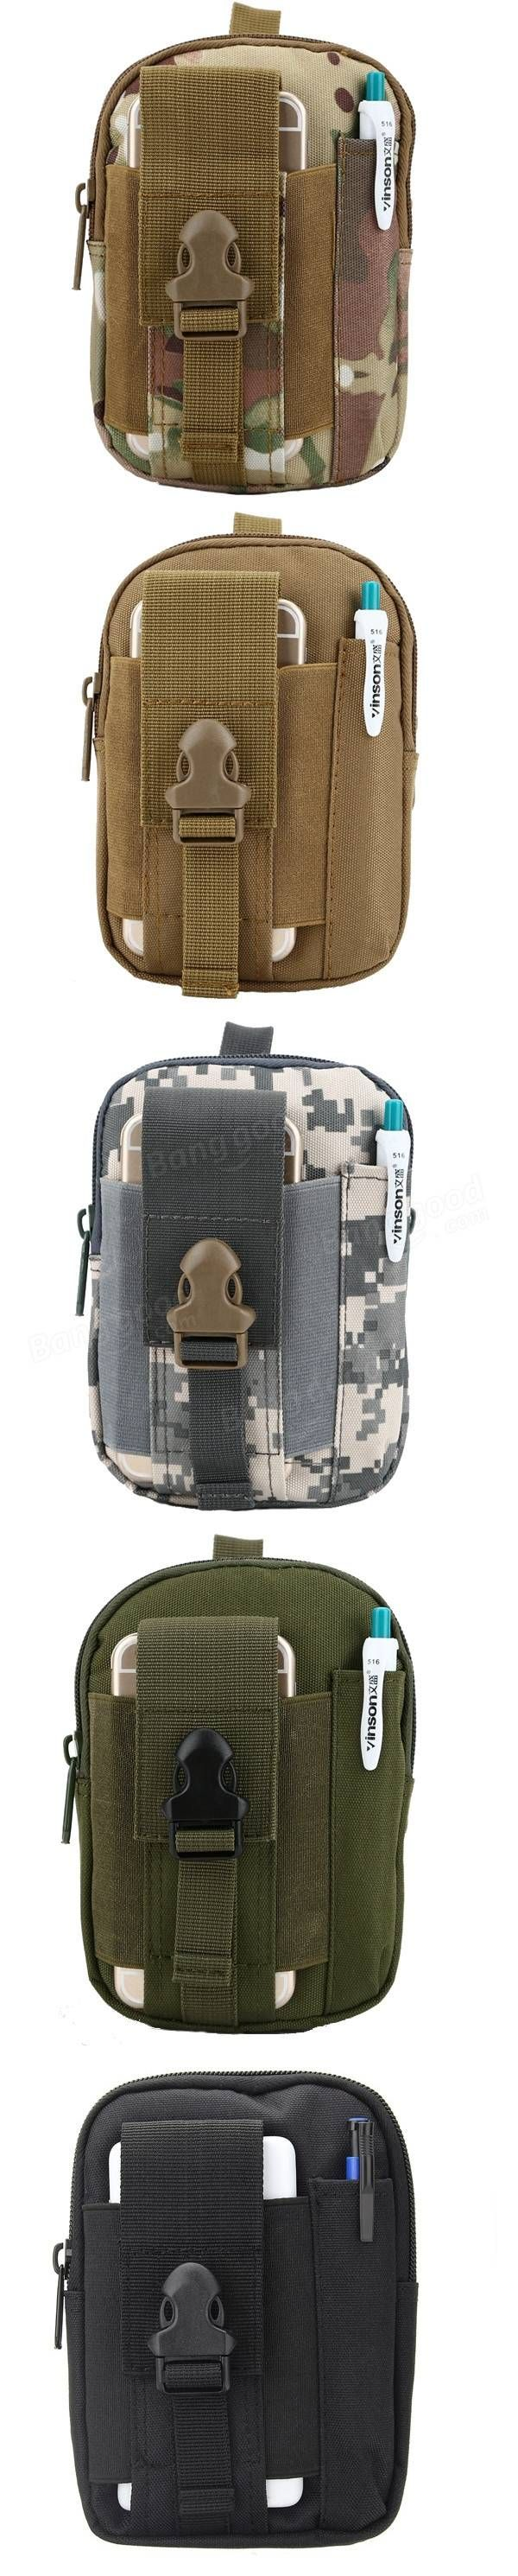 Tactical Military Outdoor Waist Shoulder Bag Pack Hiking Riding Camp Sale - Banggood.com